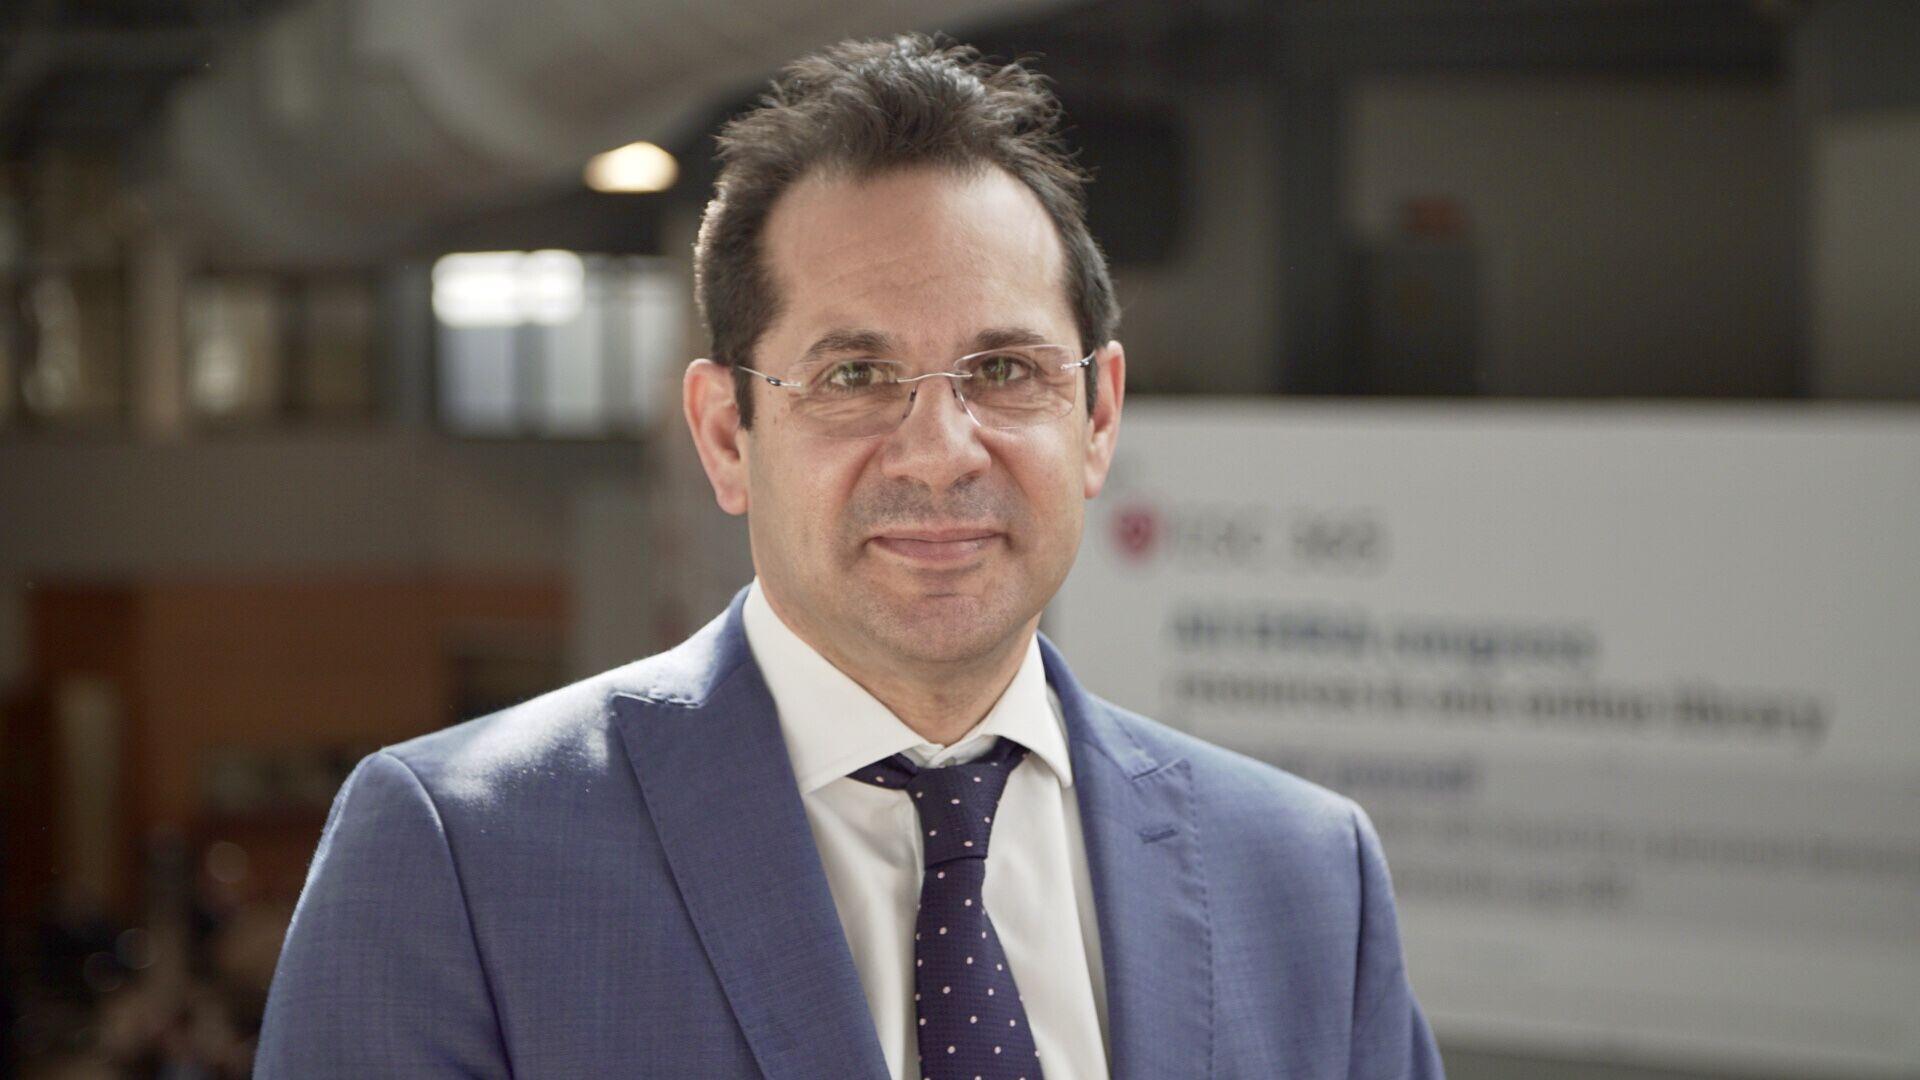 Pier Lambiase, EHRA 2019 – Sudden Death Risk in Non-ischaemic Cardiomyopathy